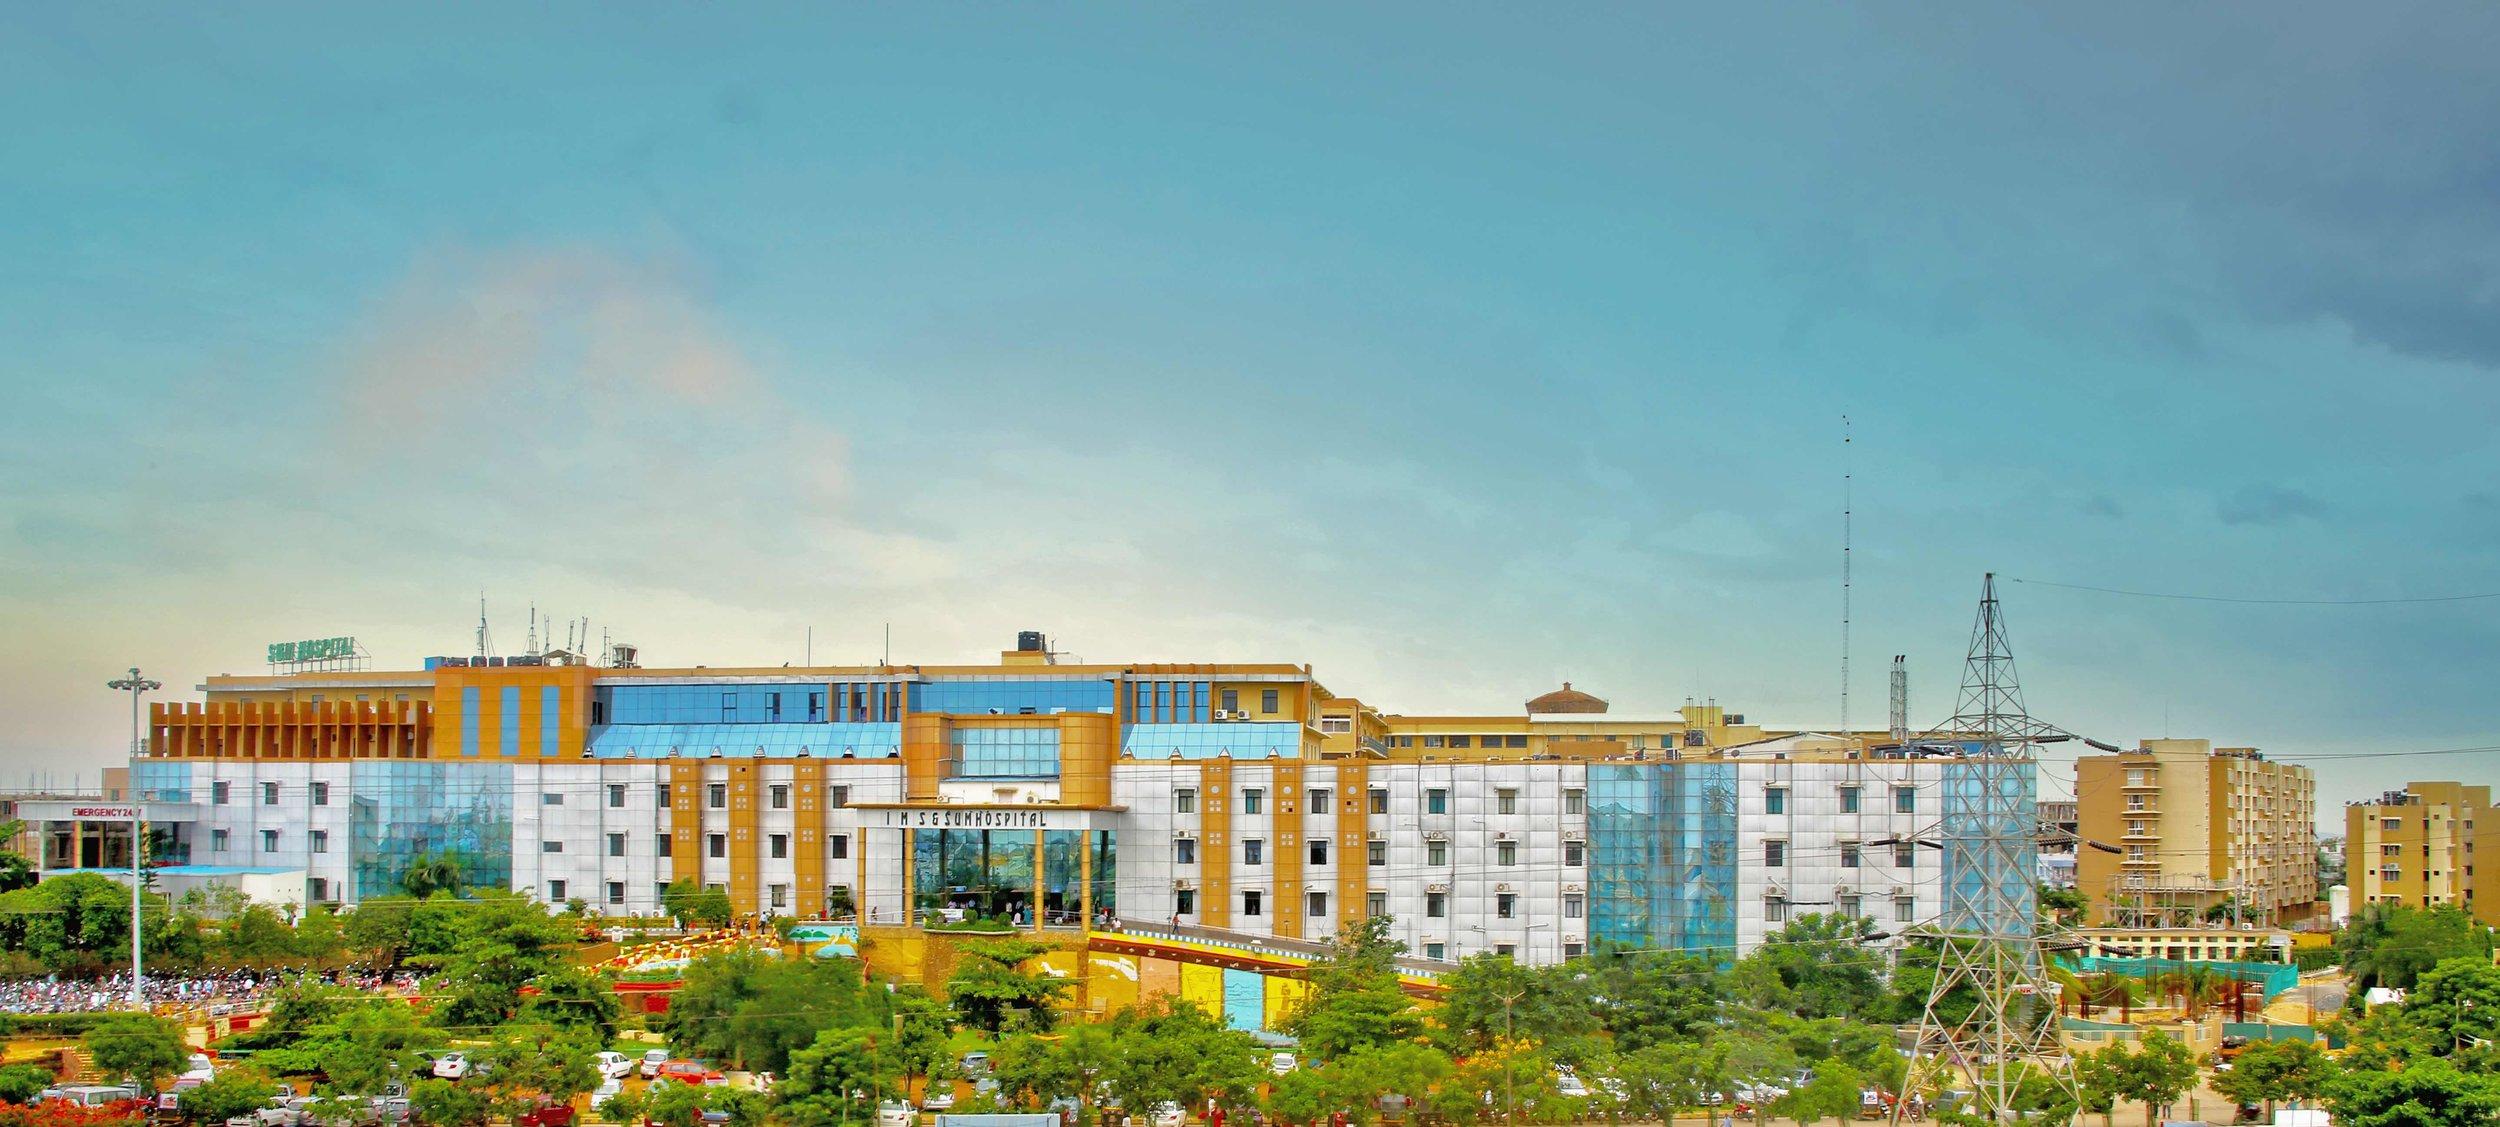 IMS and SUM HOSPITAL - Insittute of MeDICAL SCIENCES and SUM Hospital, SIKSHA 'O' ANUSANDHAN, BHUBANESWAR